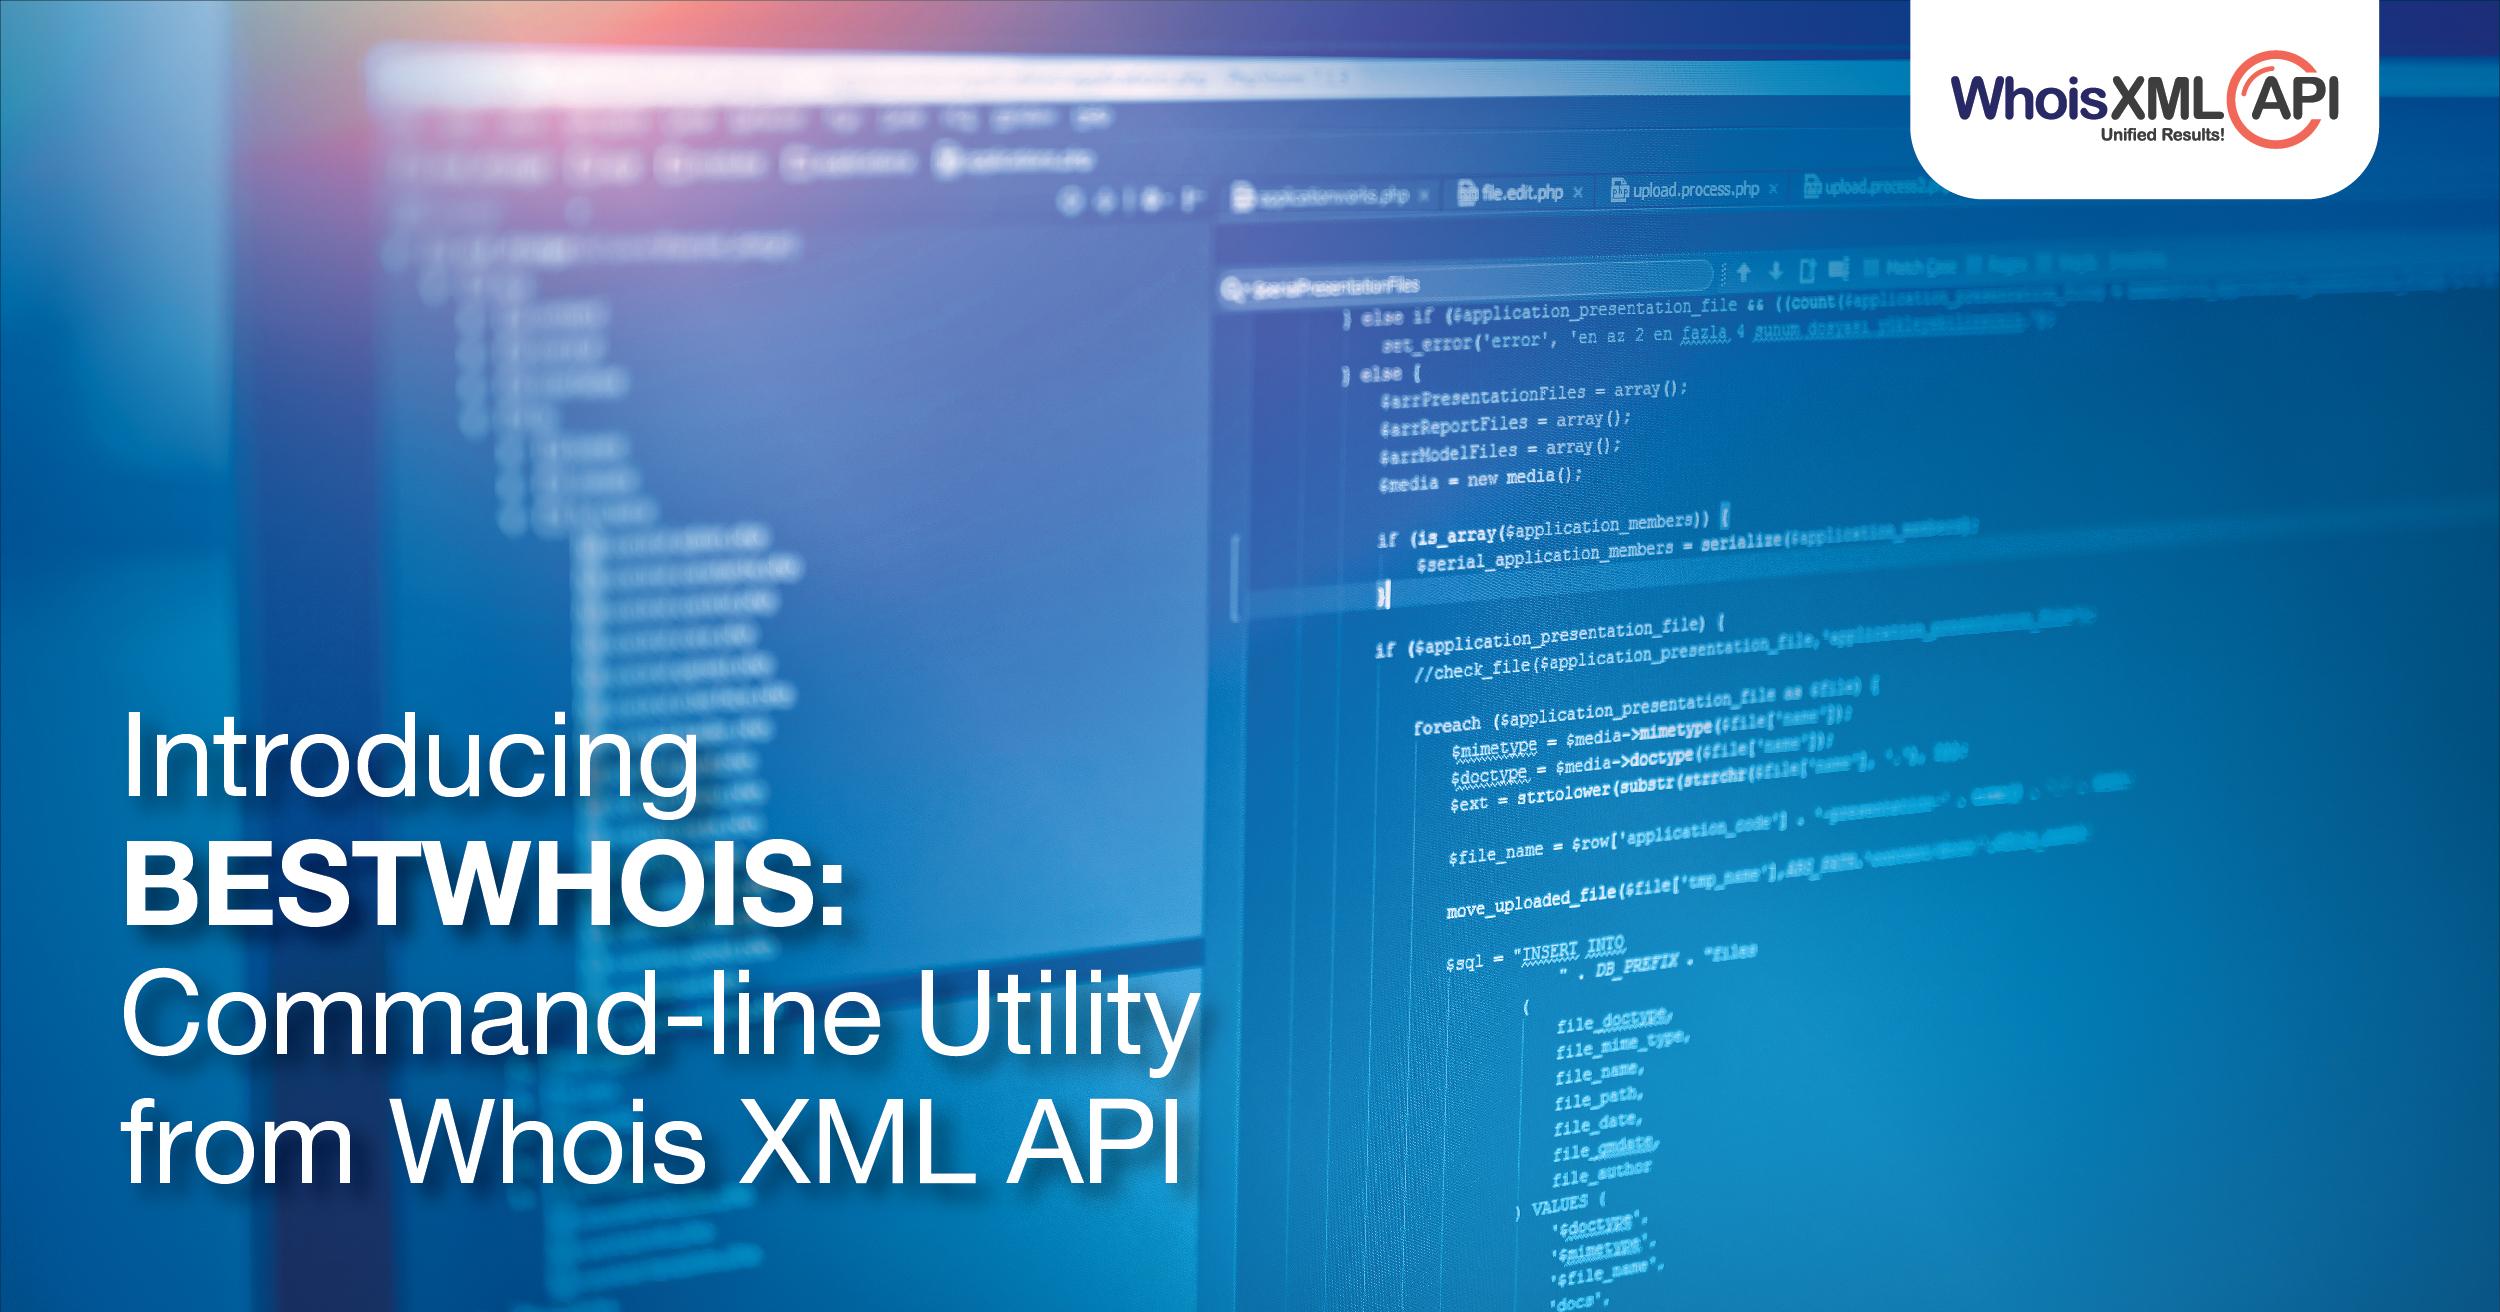 "Access Whois XML APIs hallmark real-time & historic Whois via a cross-platform command-line utility, ""bestwhois""."